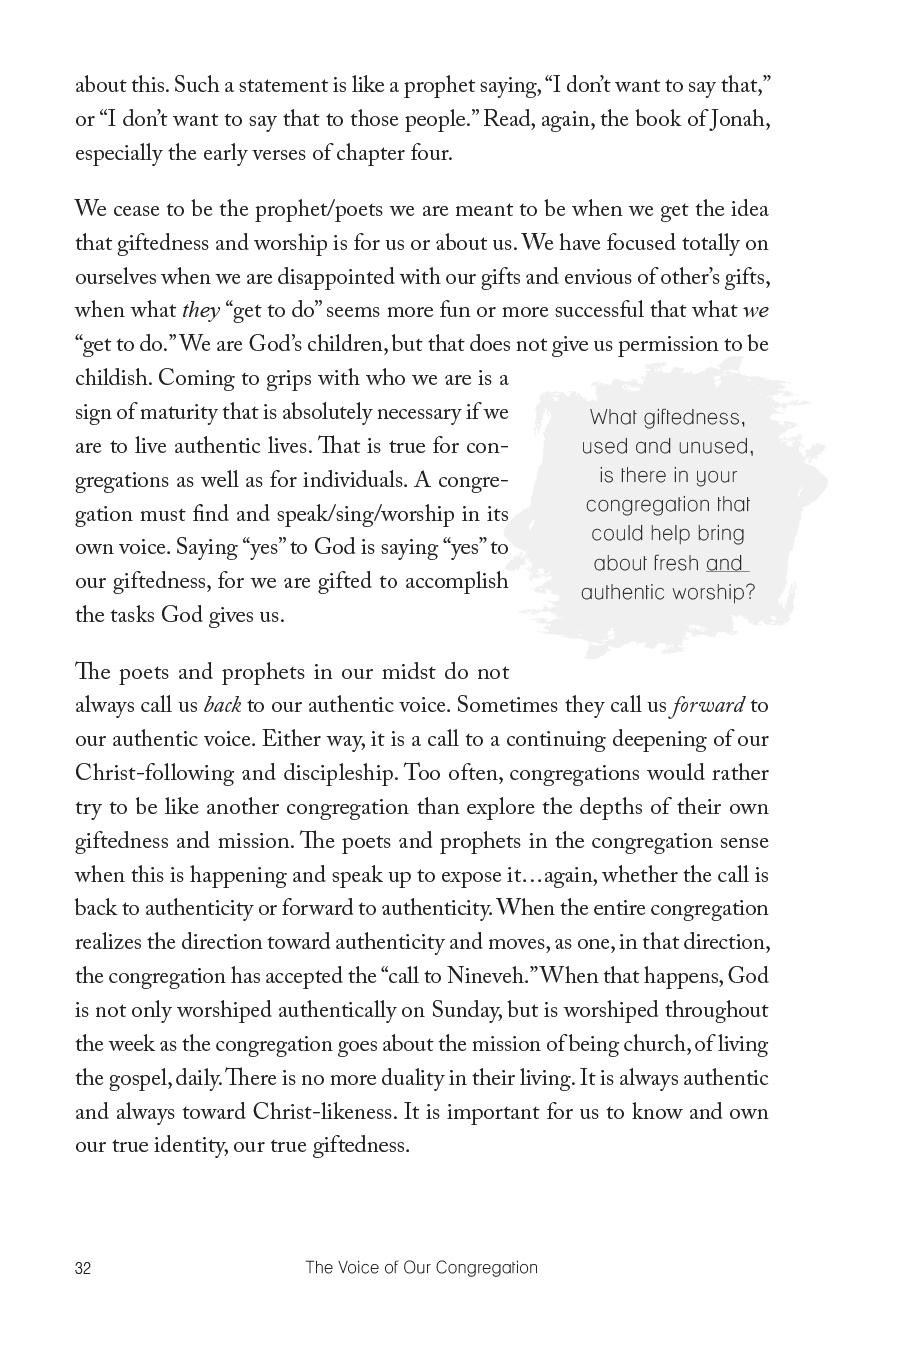 christian music book interior layout.jpg